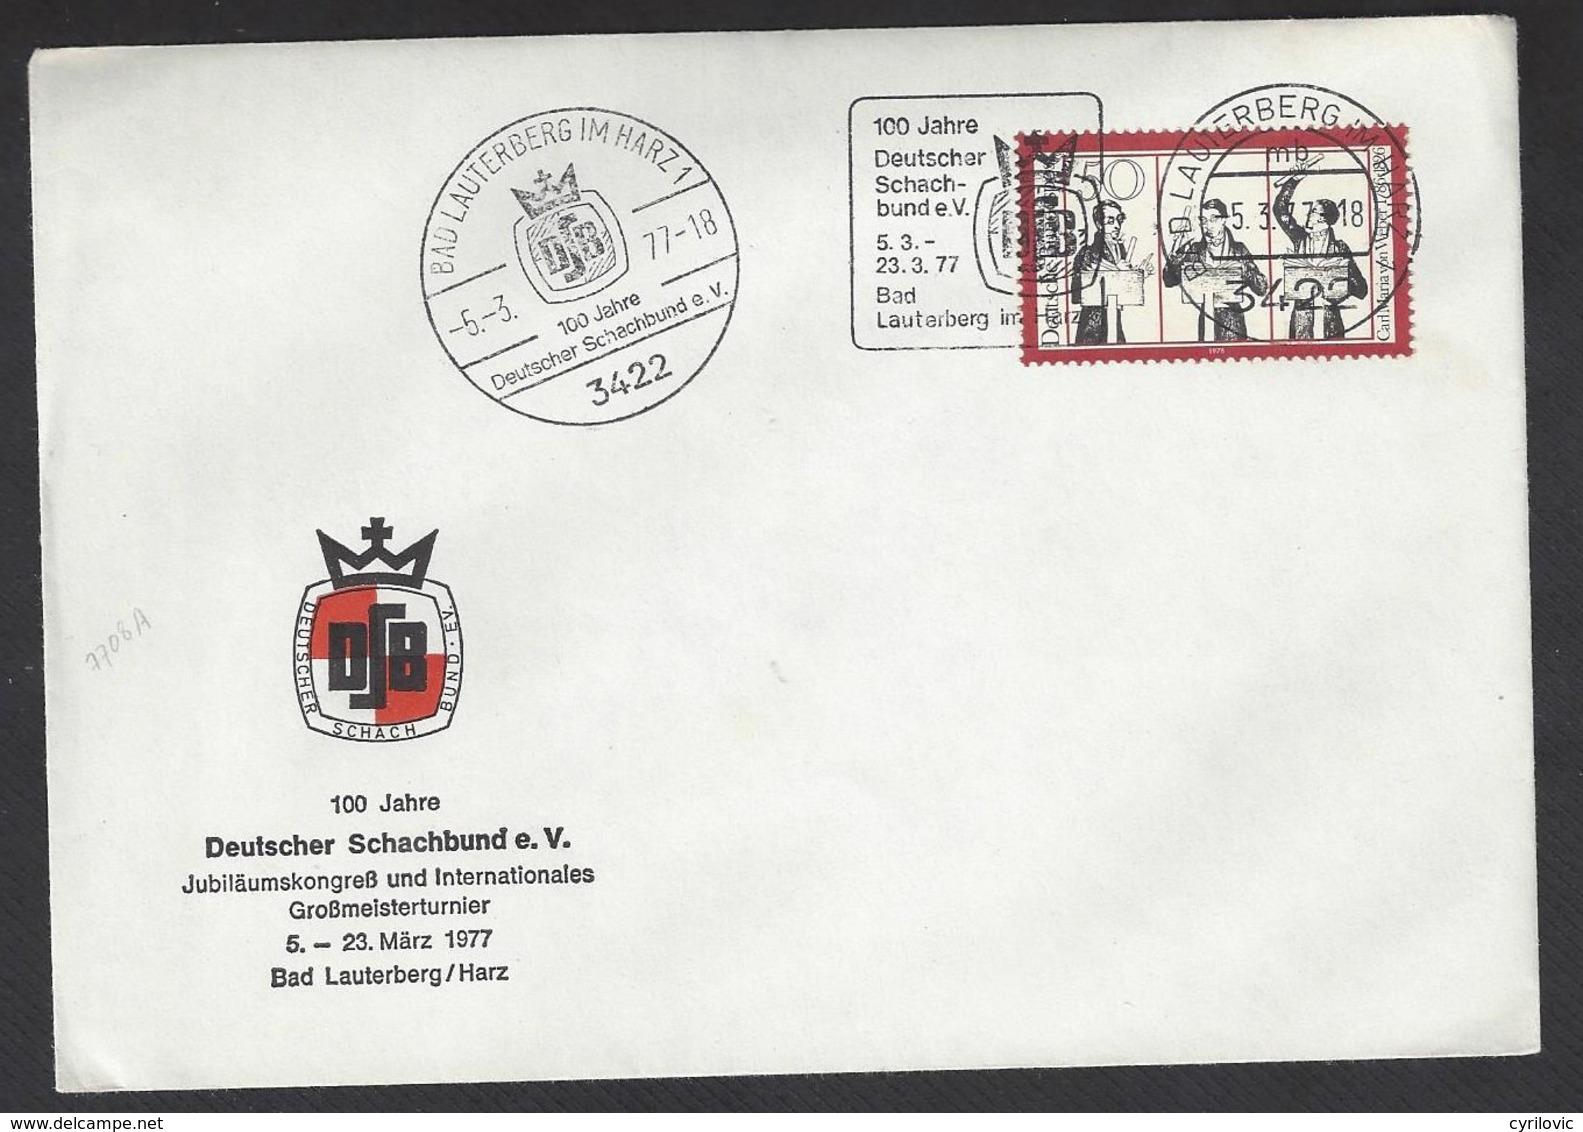 Chess, Germany Bad Lauterburg, 05.03.1977, Special Cancel & Roller Type Cancel On Envelope, 100th Anniversary German CF - Schaken